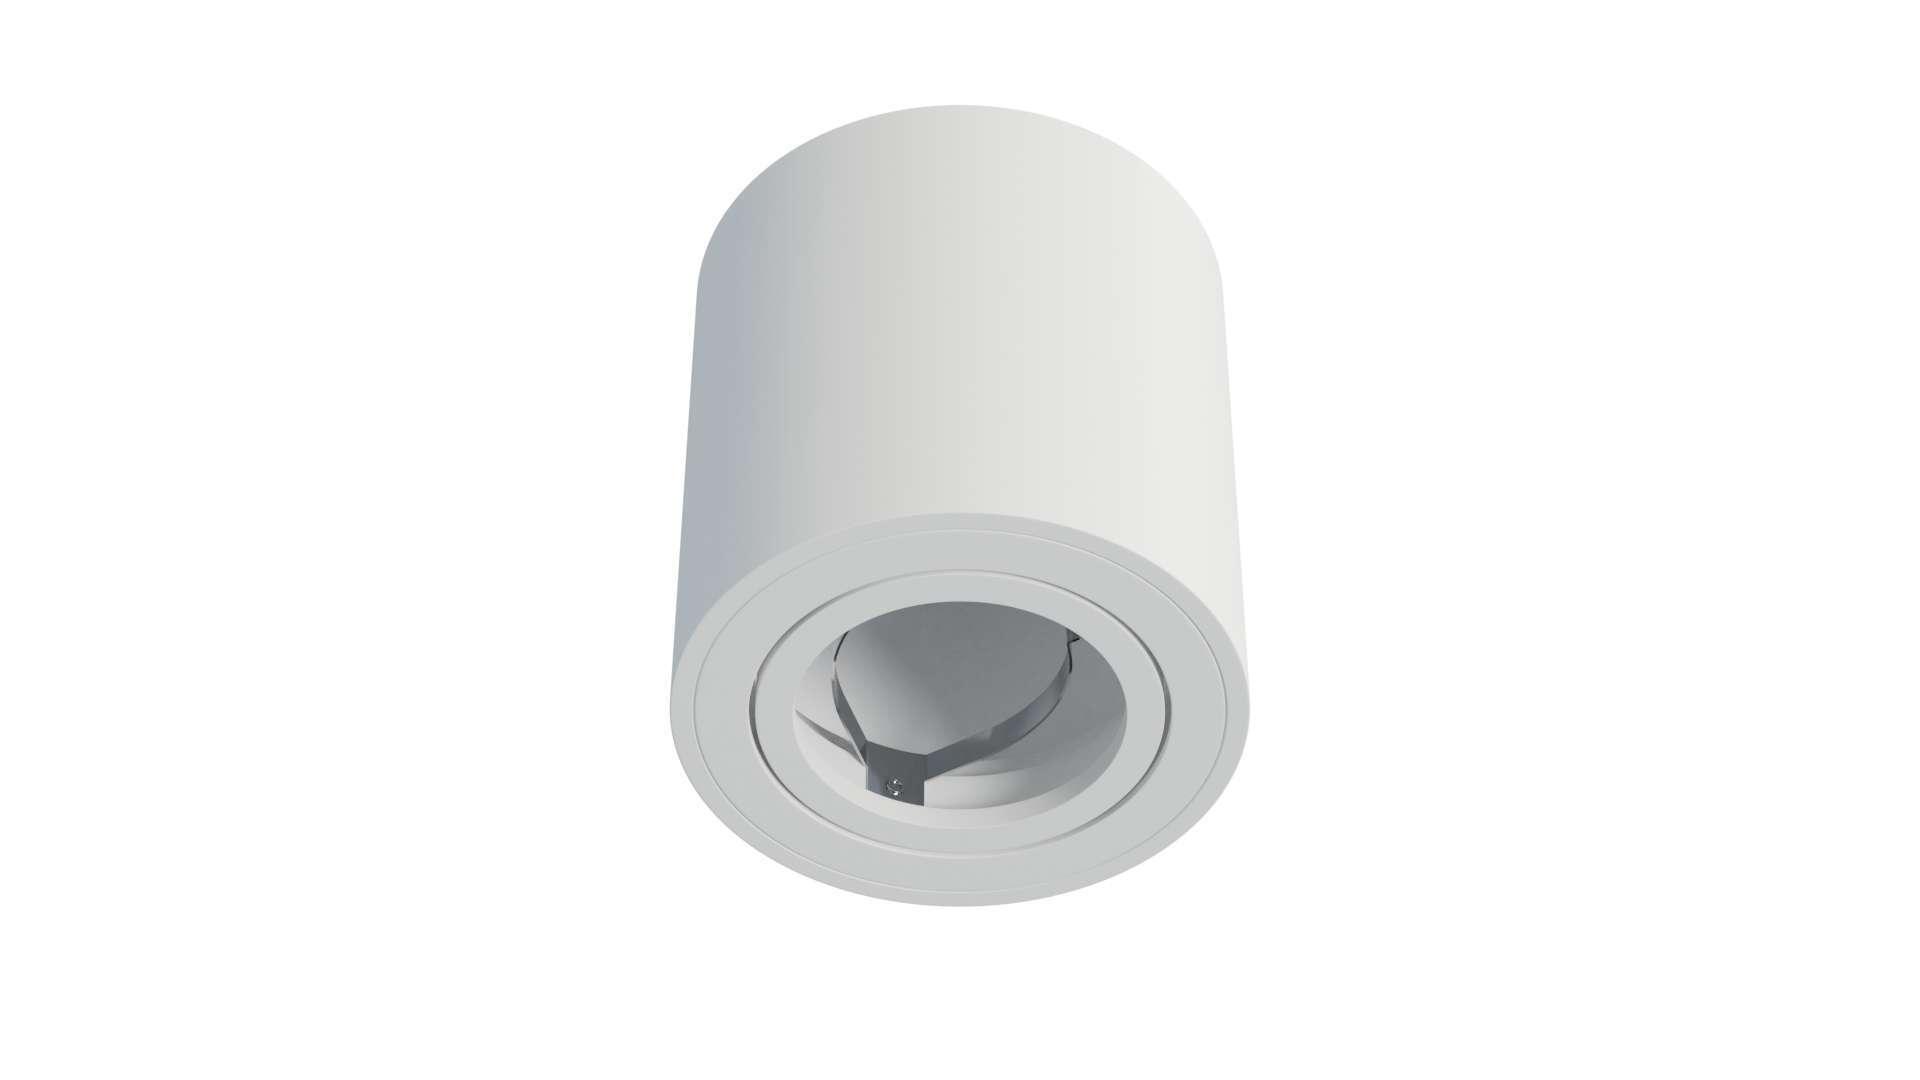 Ceiling spotlight fixture SPOT OREA round white